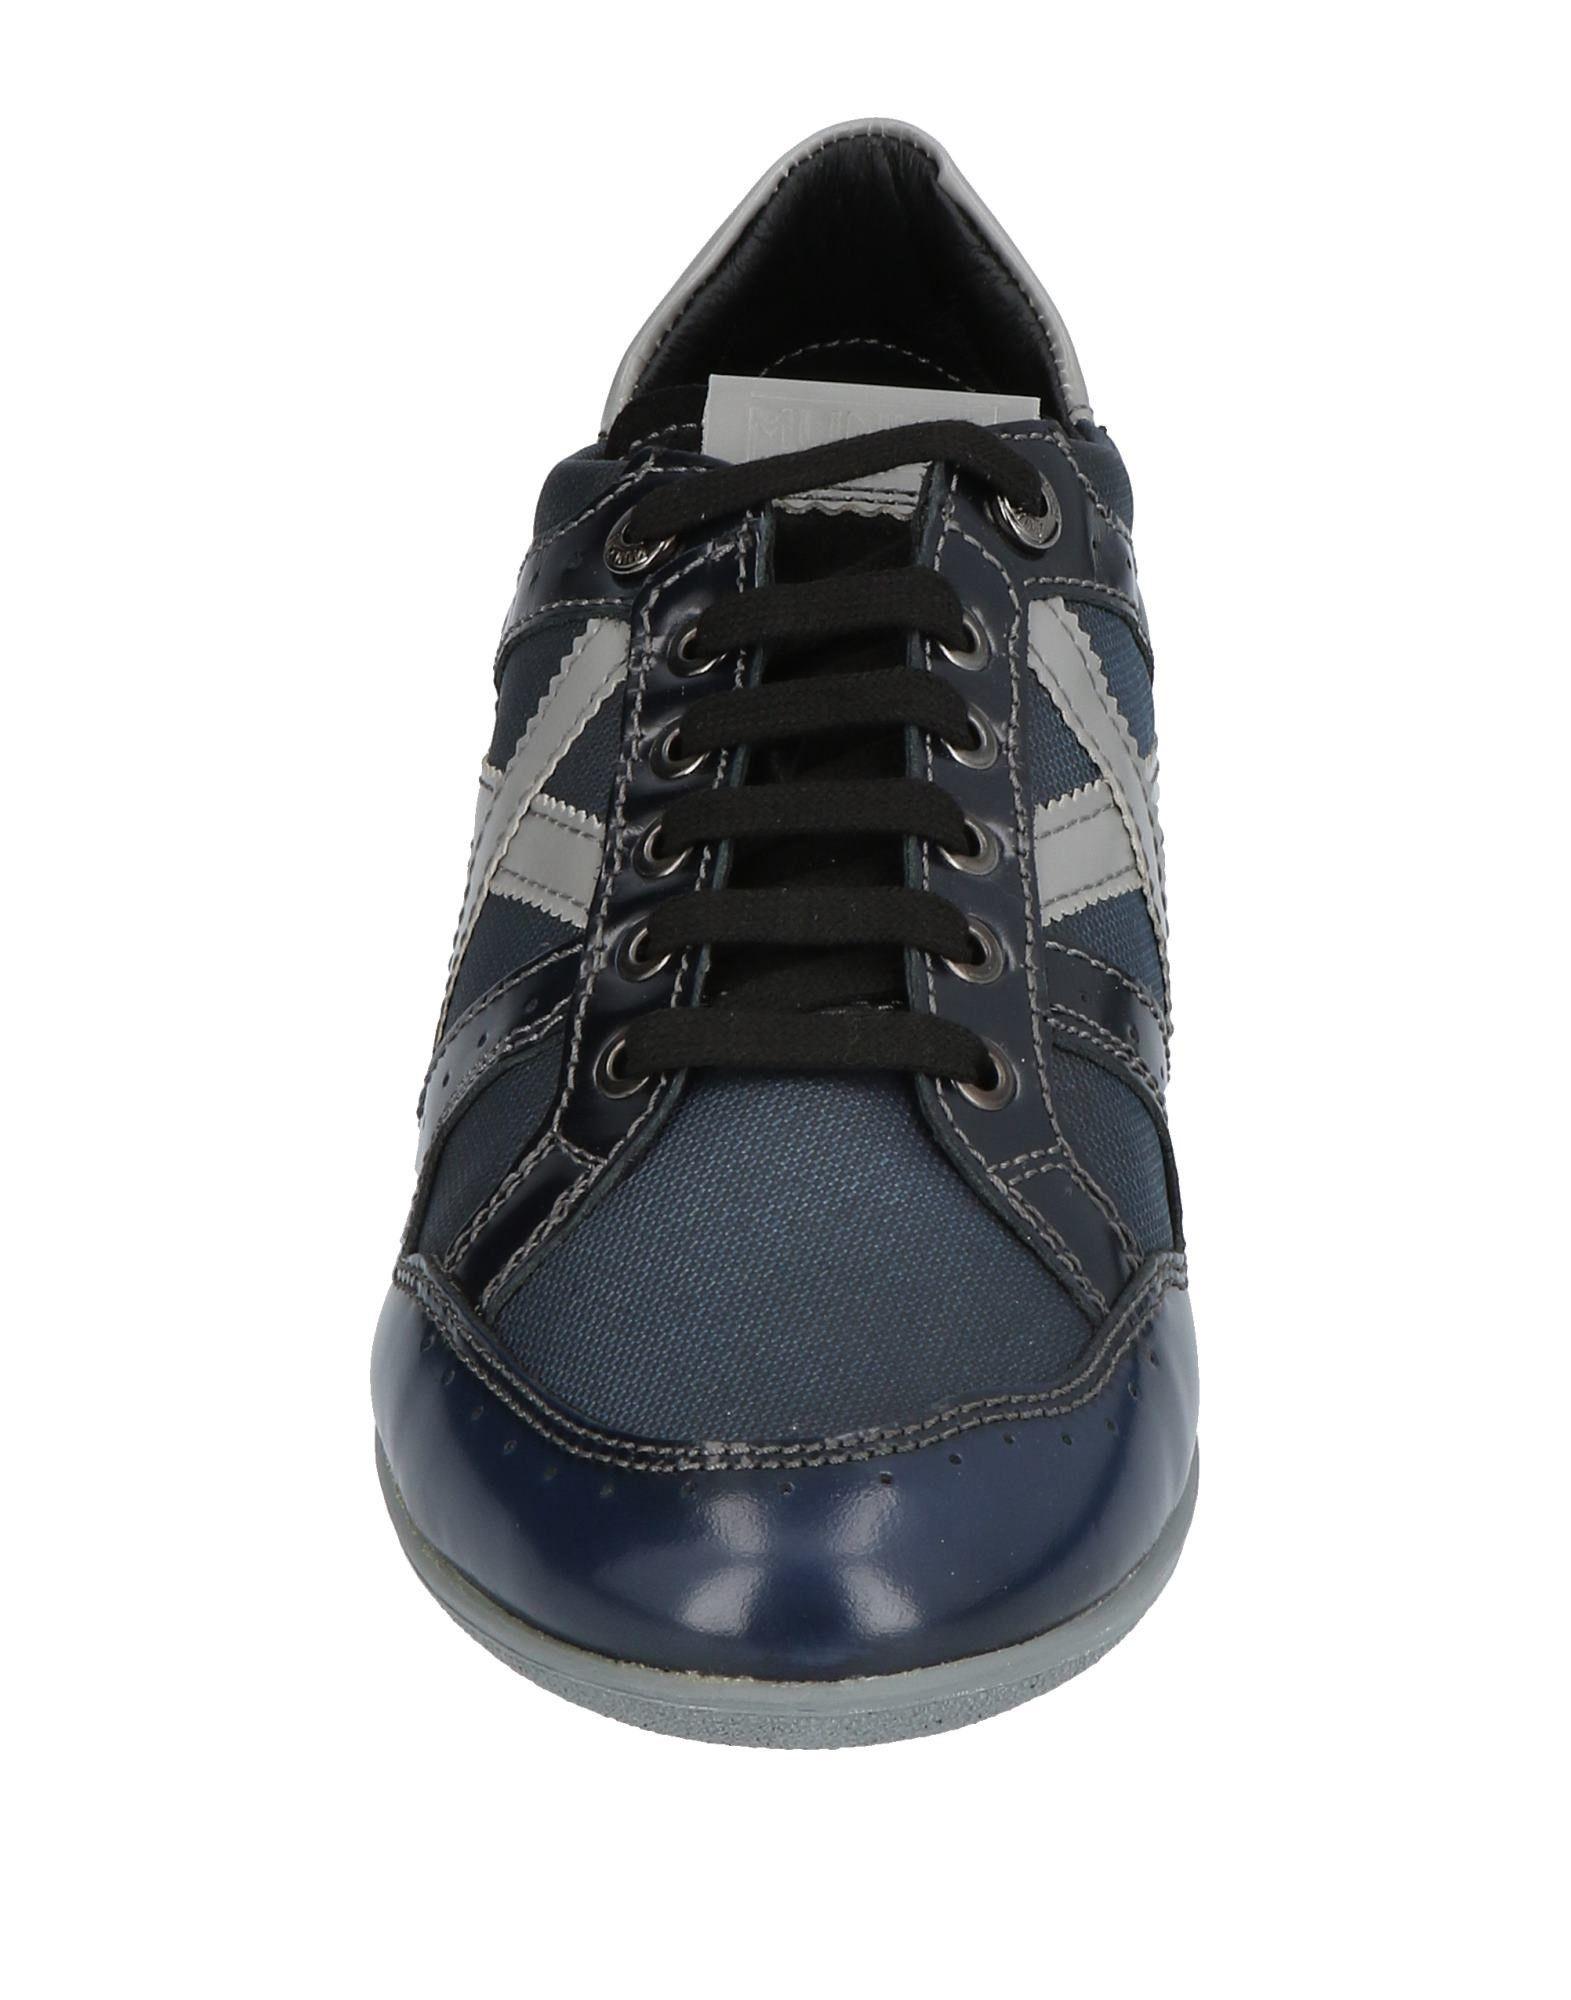 Rabatt Schuhe echte Schuhe Rabatt Munich Sneakers Herren  11423793DJ 3115dd